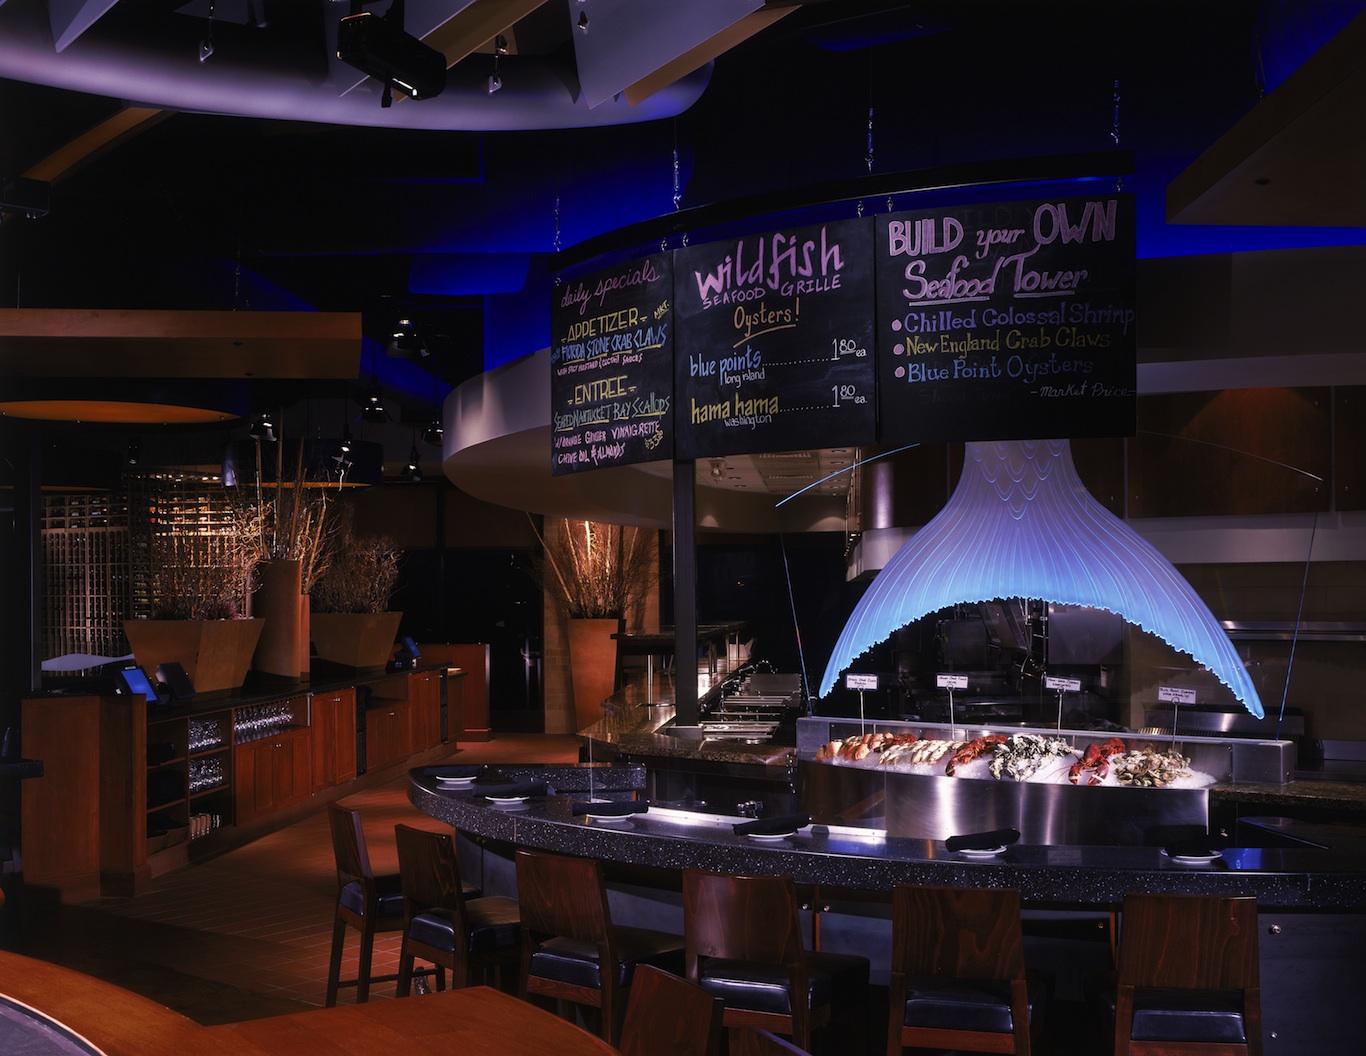 Wildfish Restaurant and Bar